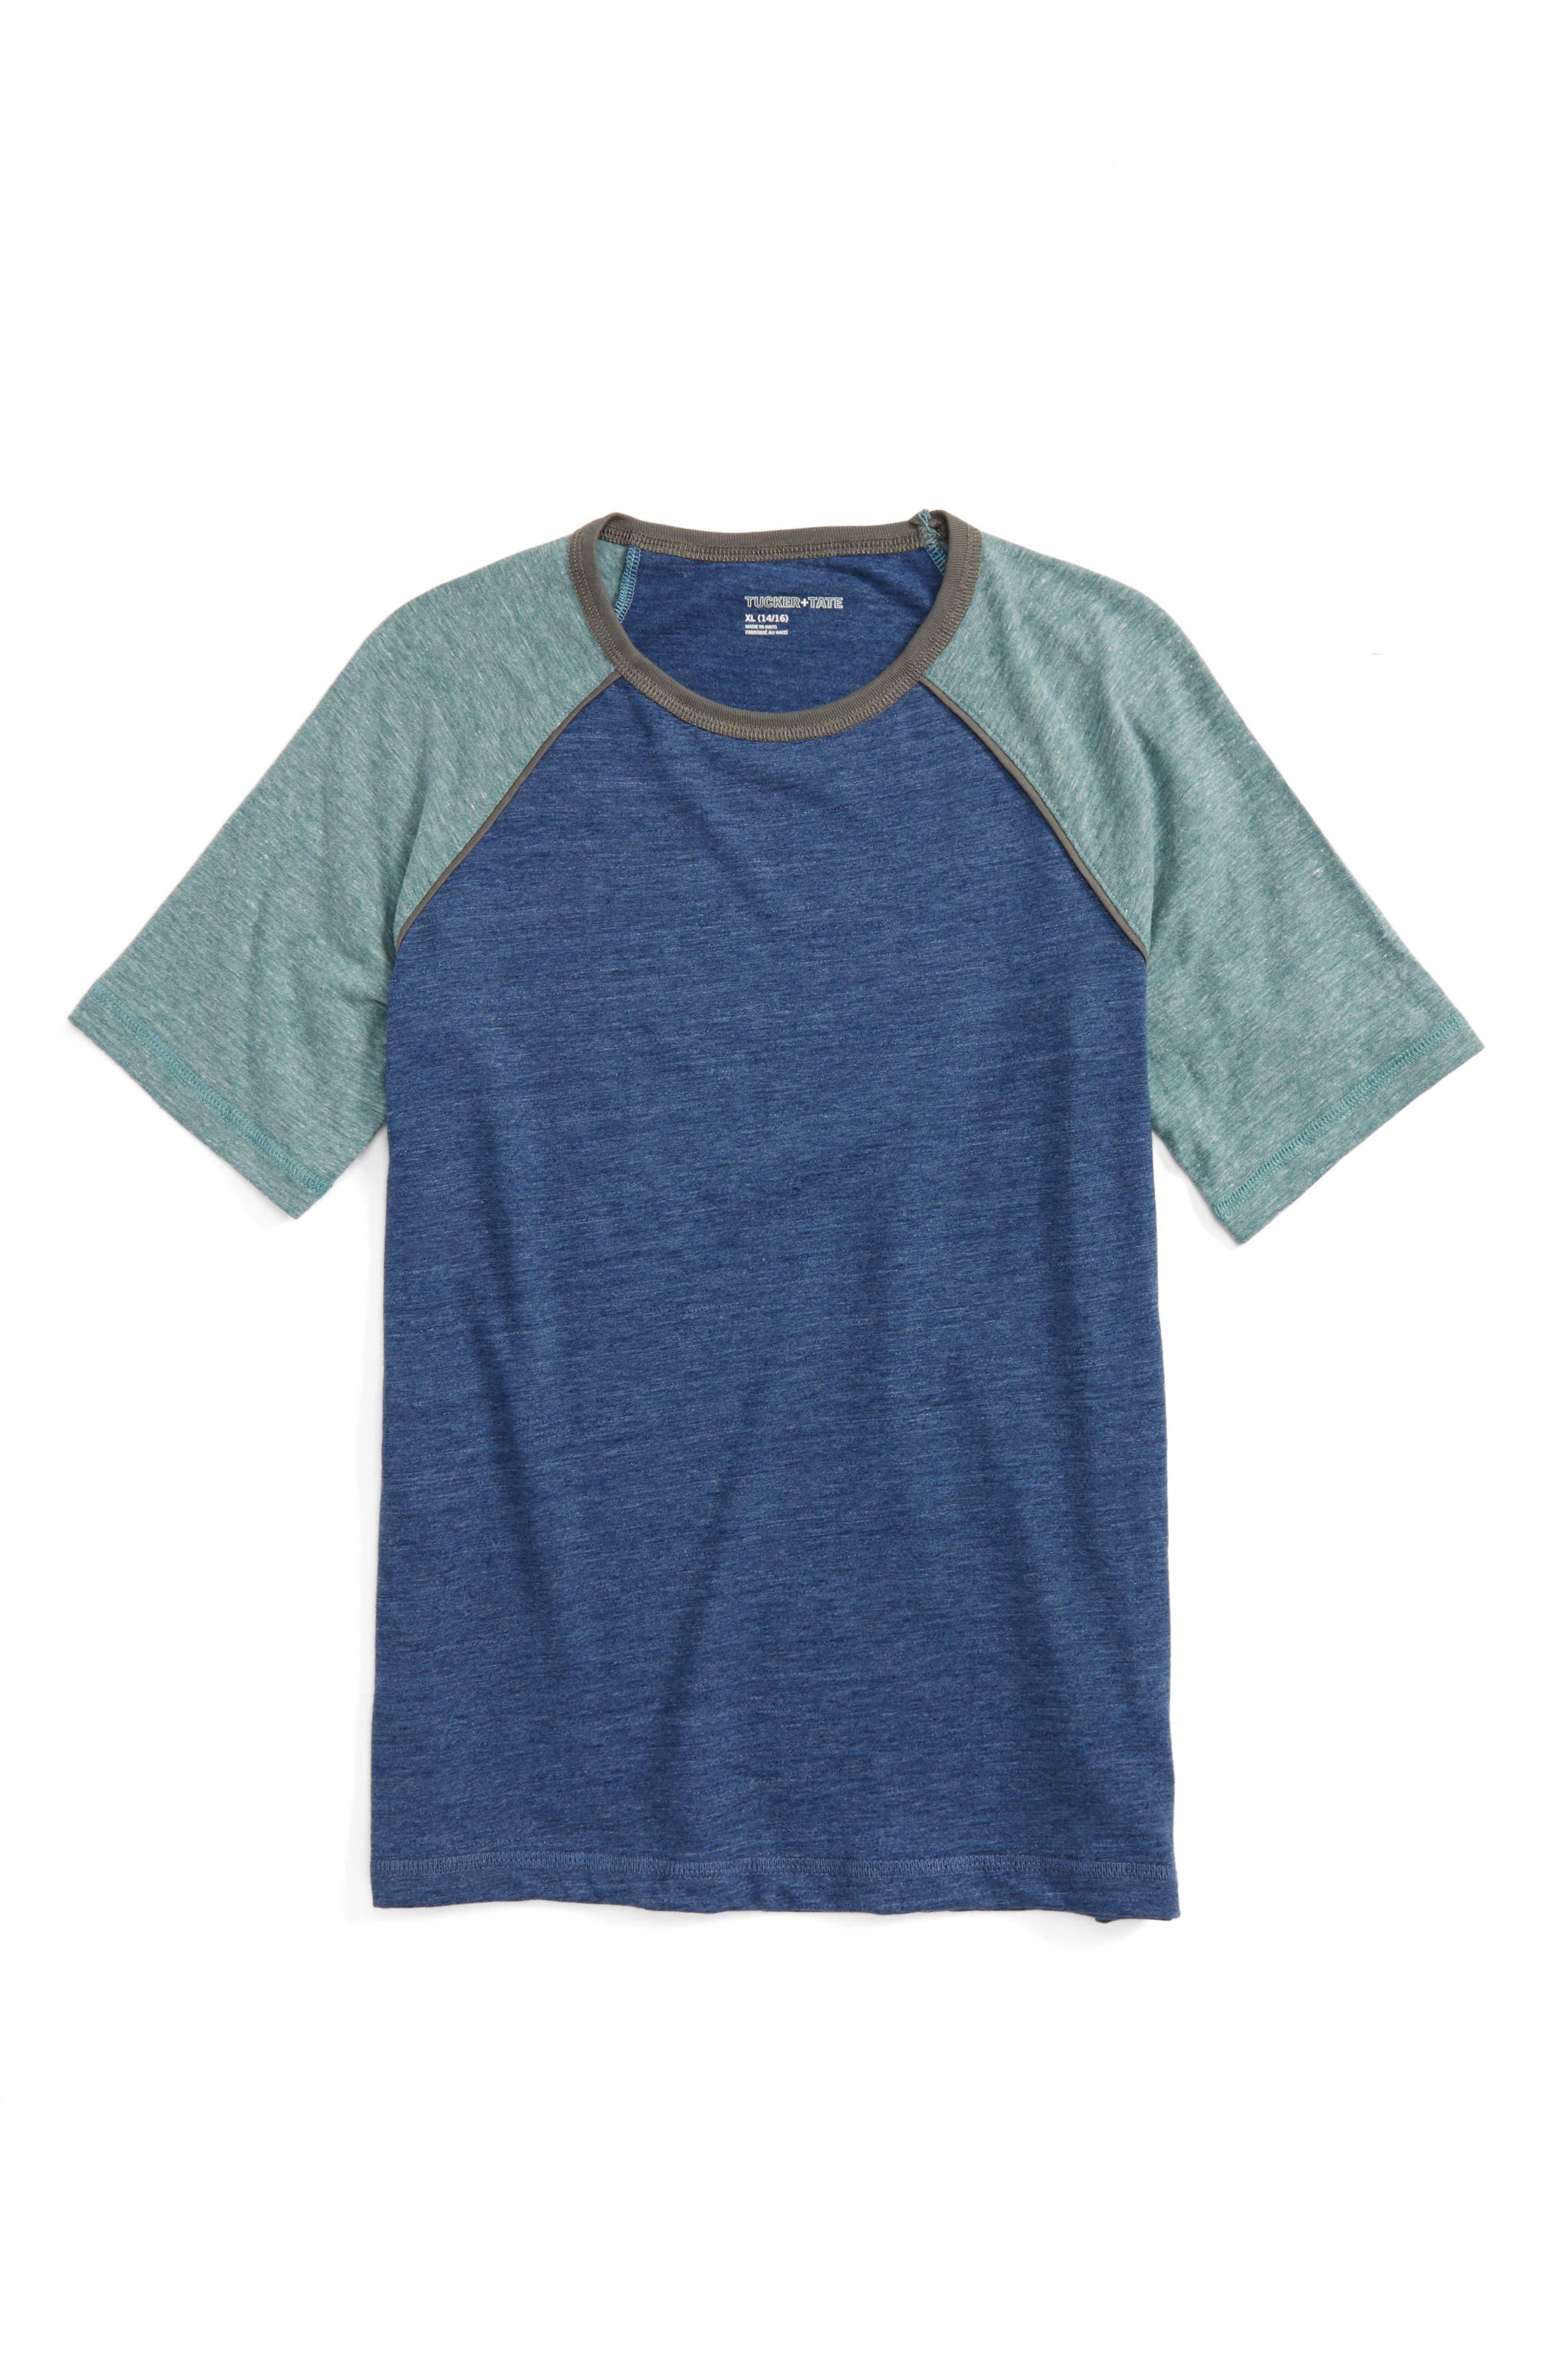 Alternate Image 1 Selected - Tucker + Tate Baseball T-Shirt (Big Boys)